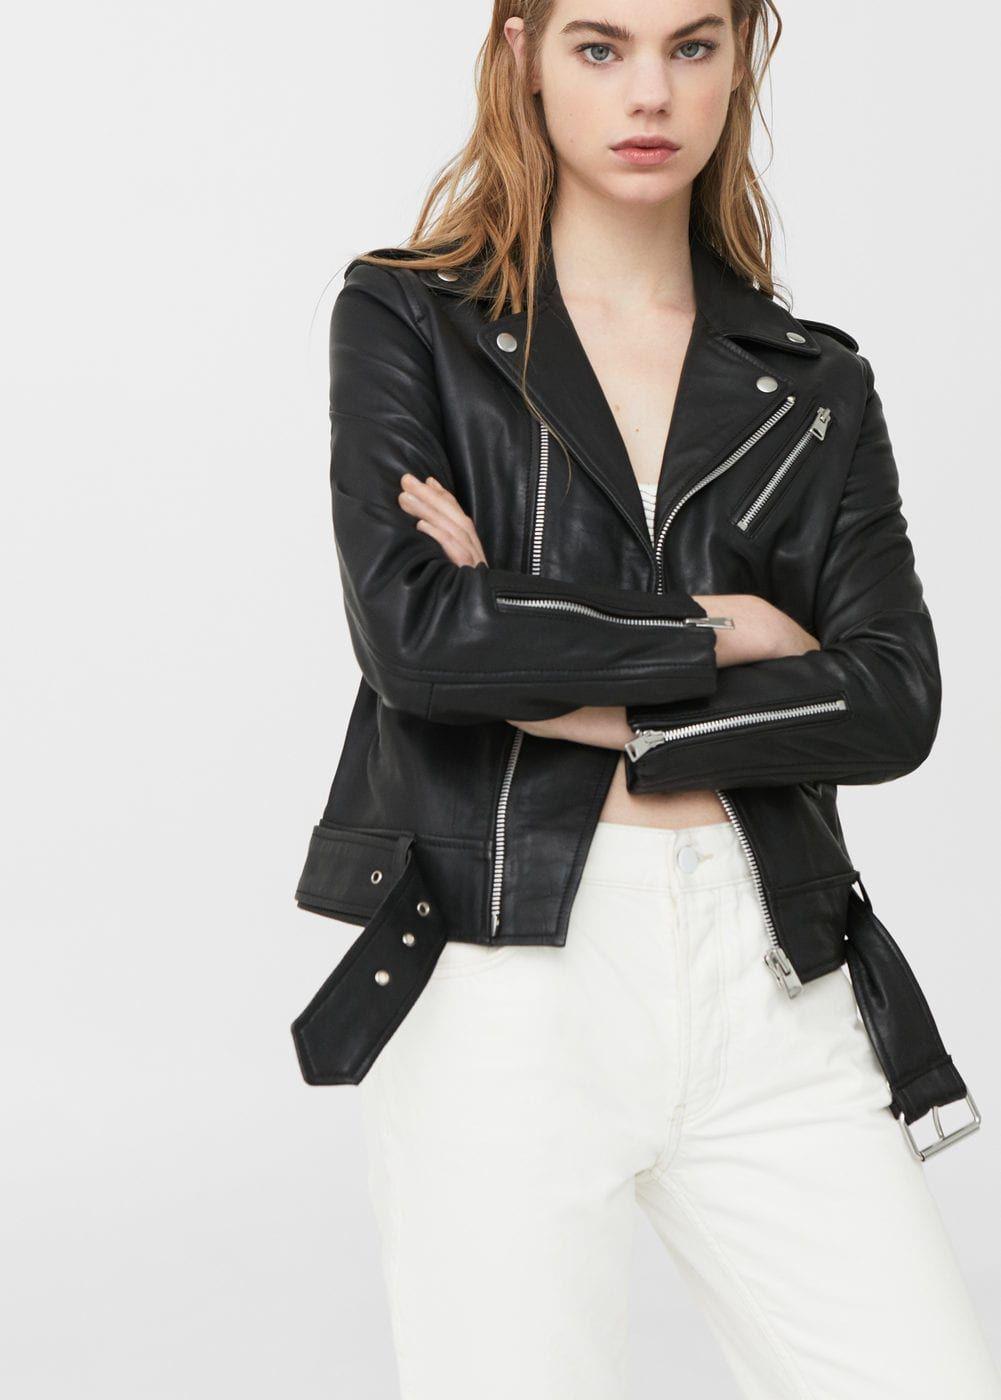 fca45926f5845 Leather biker jacket - Women | Jackets | Perfecto cuir femme ...